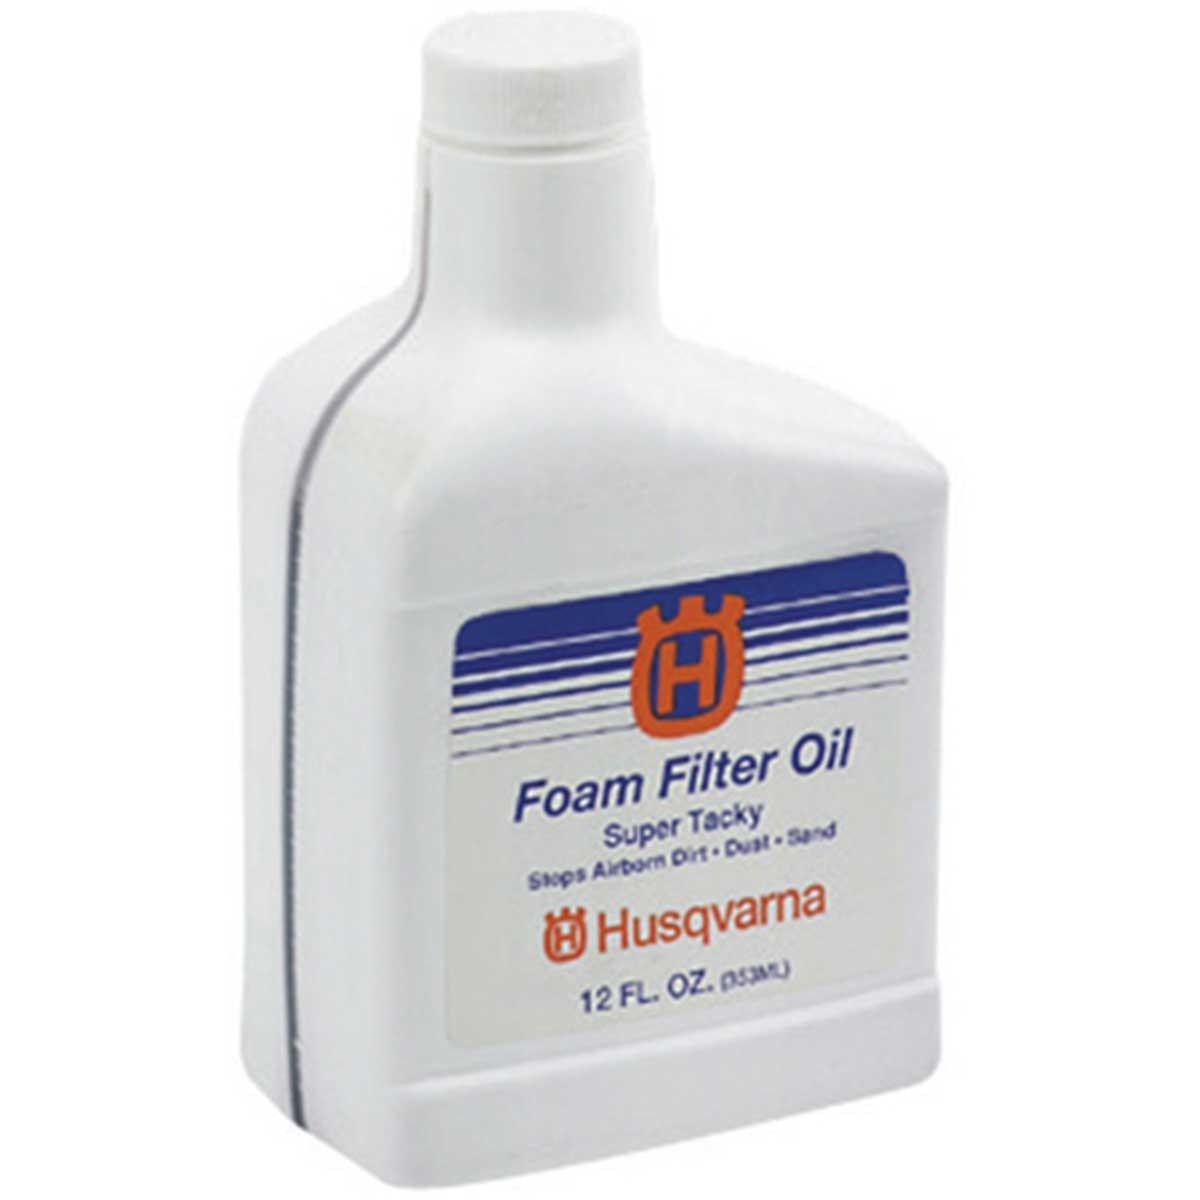 Husqvarna Foam Filter Oil